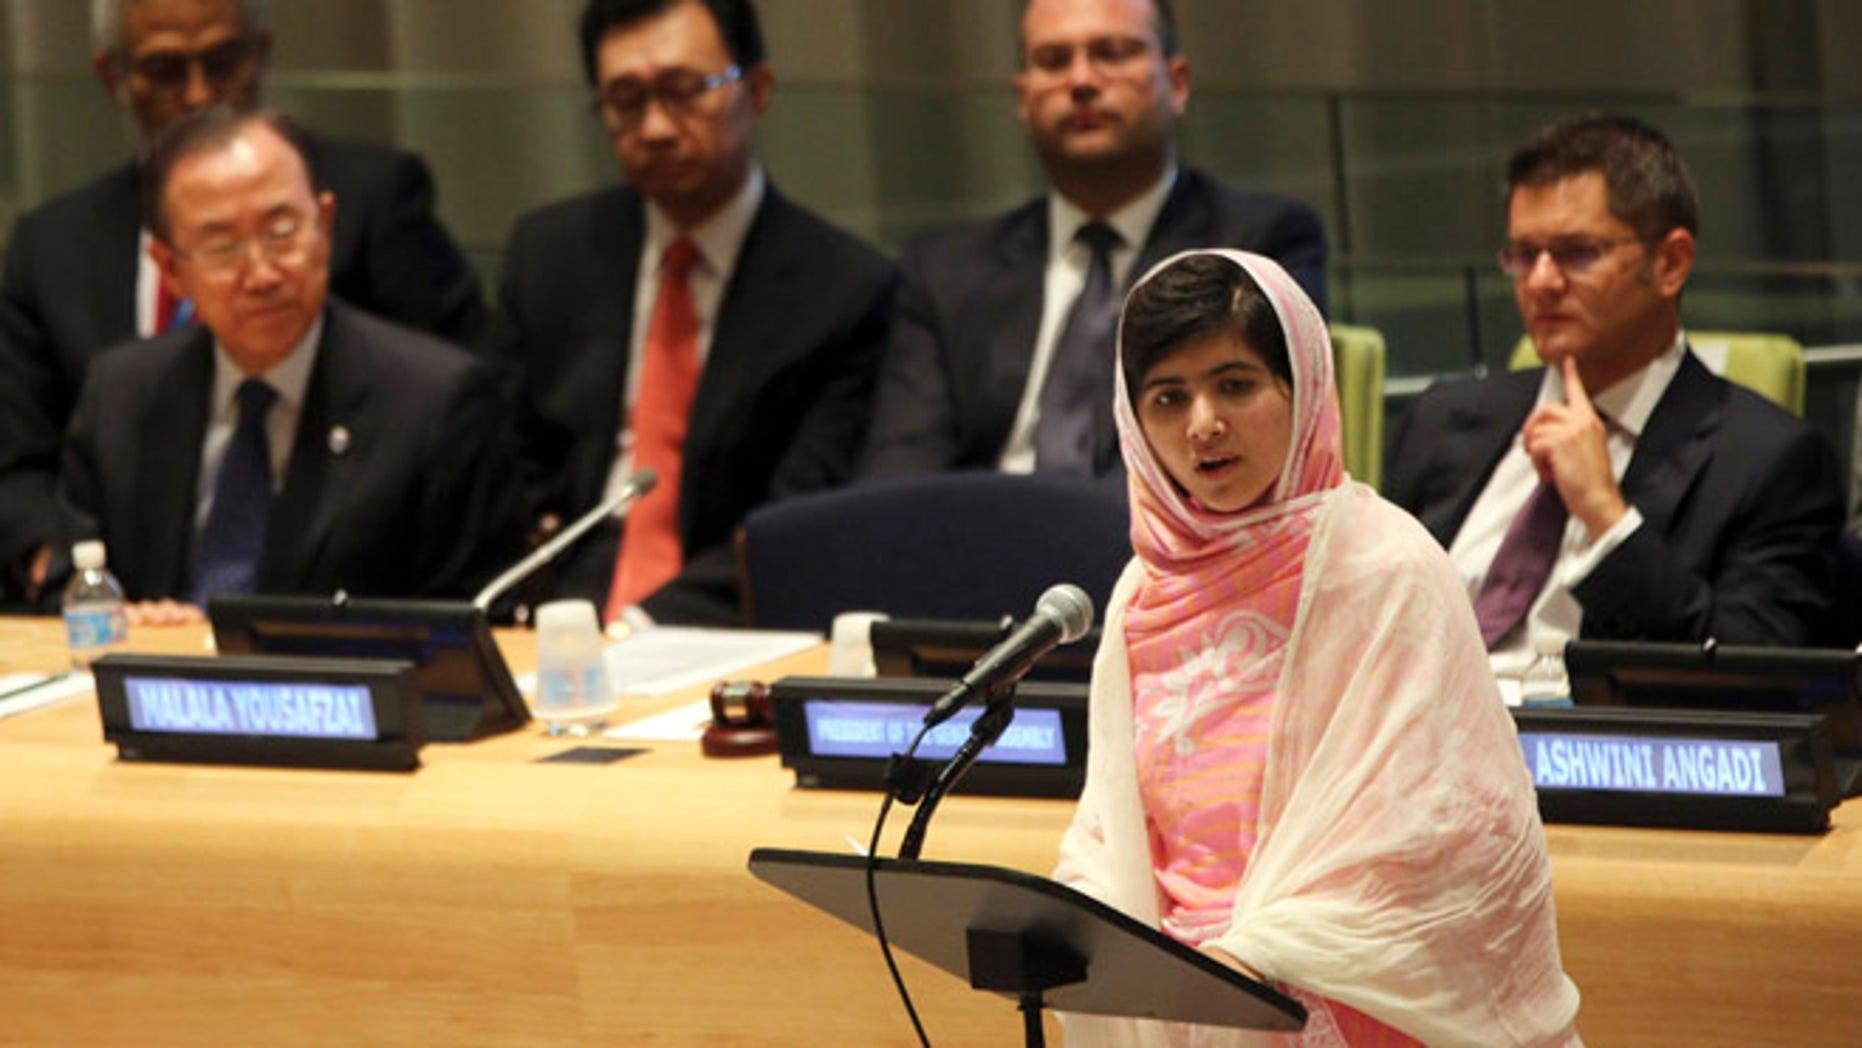 July 12, 2013: United Nations Secretary-General Ban Ki-moon, left, listens as  Malala Yousafzai, right, addresses the Malala Day Youth Assembly at United Nations headquarters.